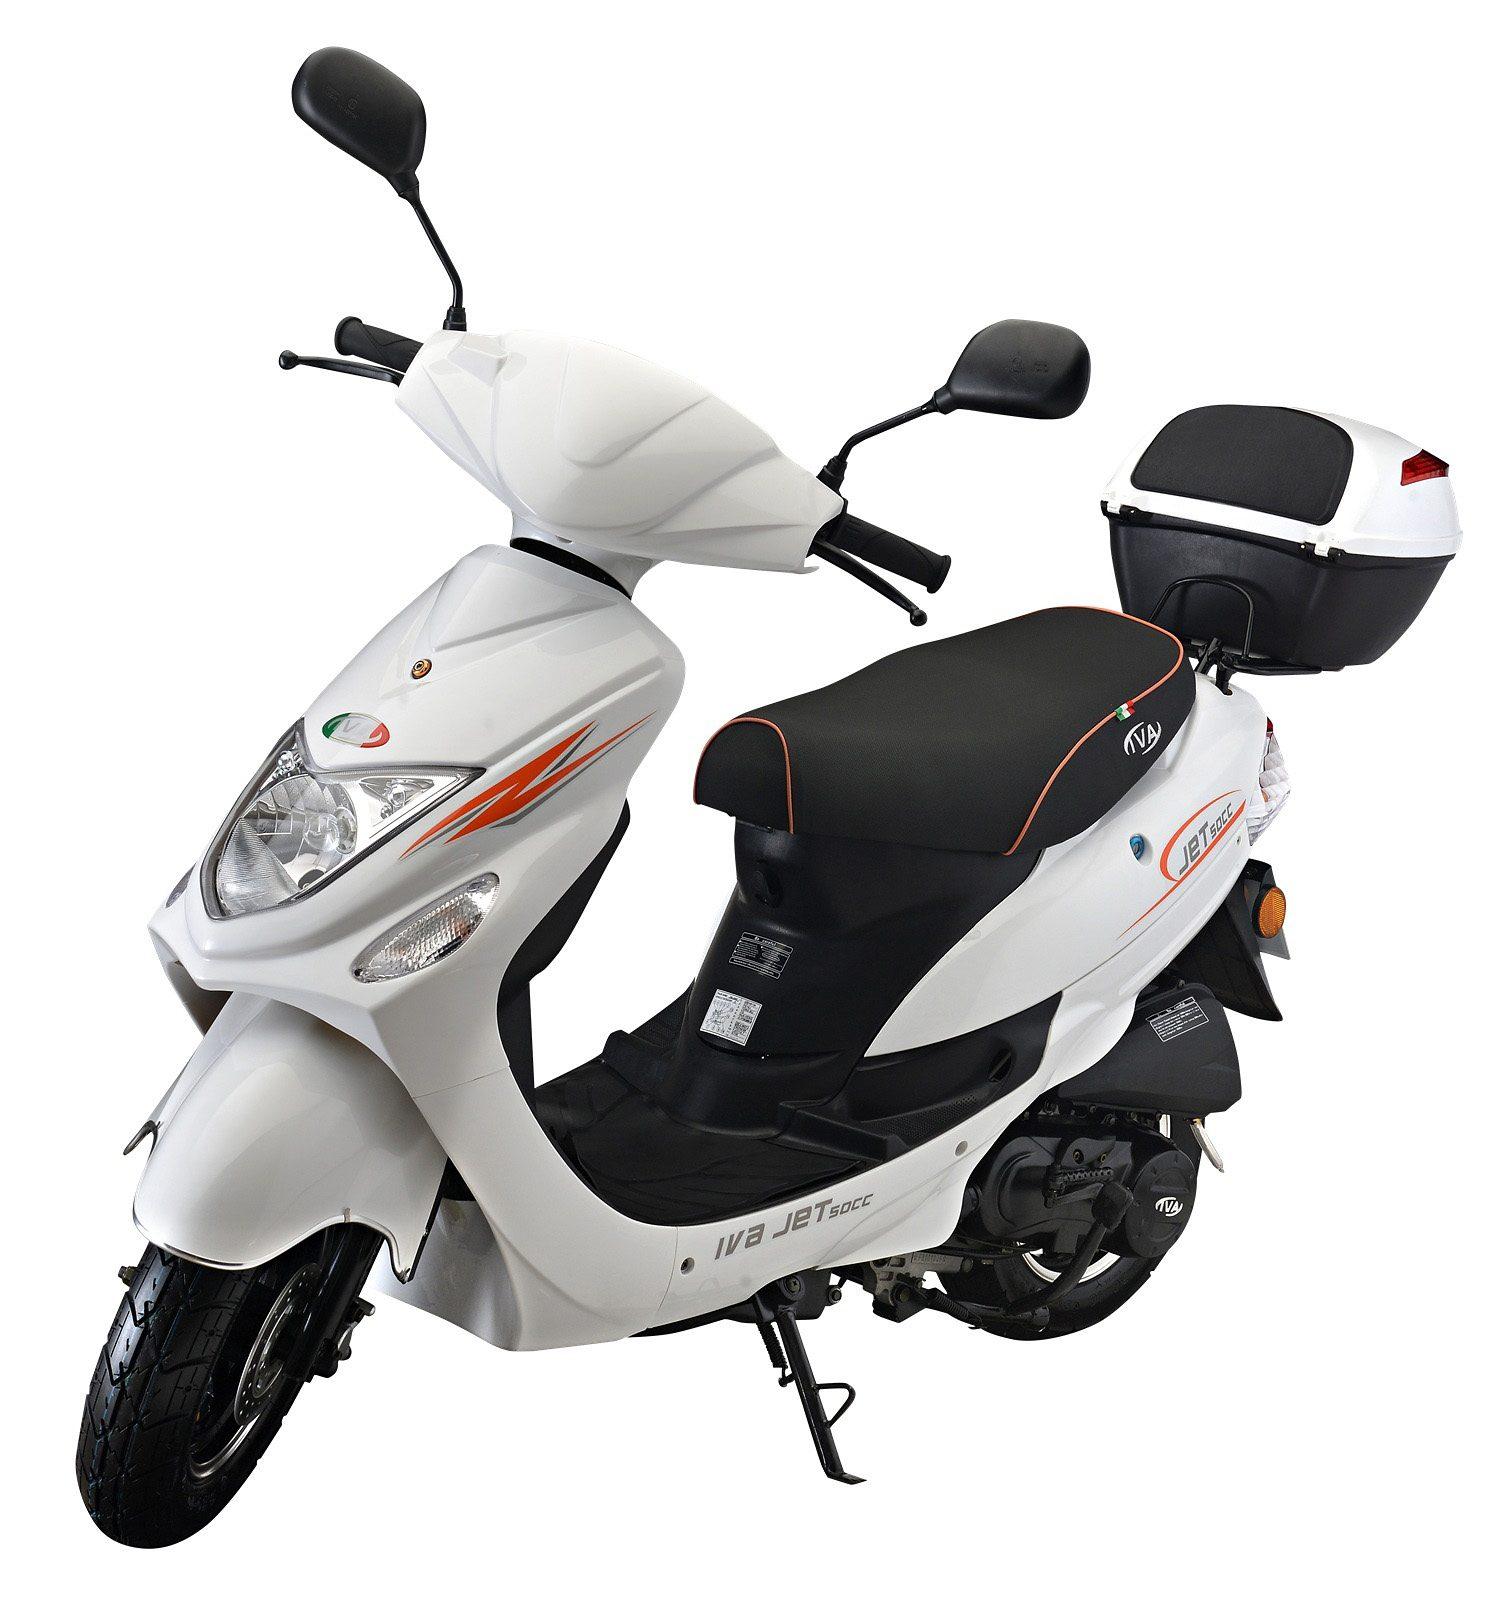 IVA Motorroller inkl. Topcase, 49 ccm, 45 km/h, weiß, »Jet New«